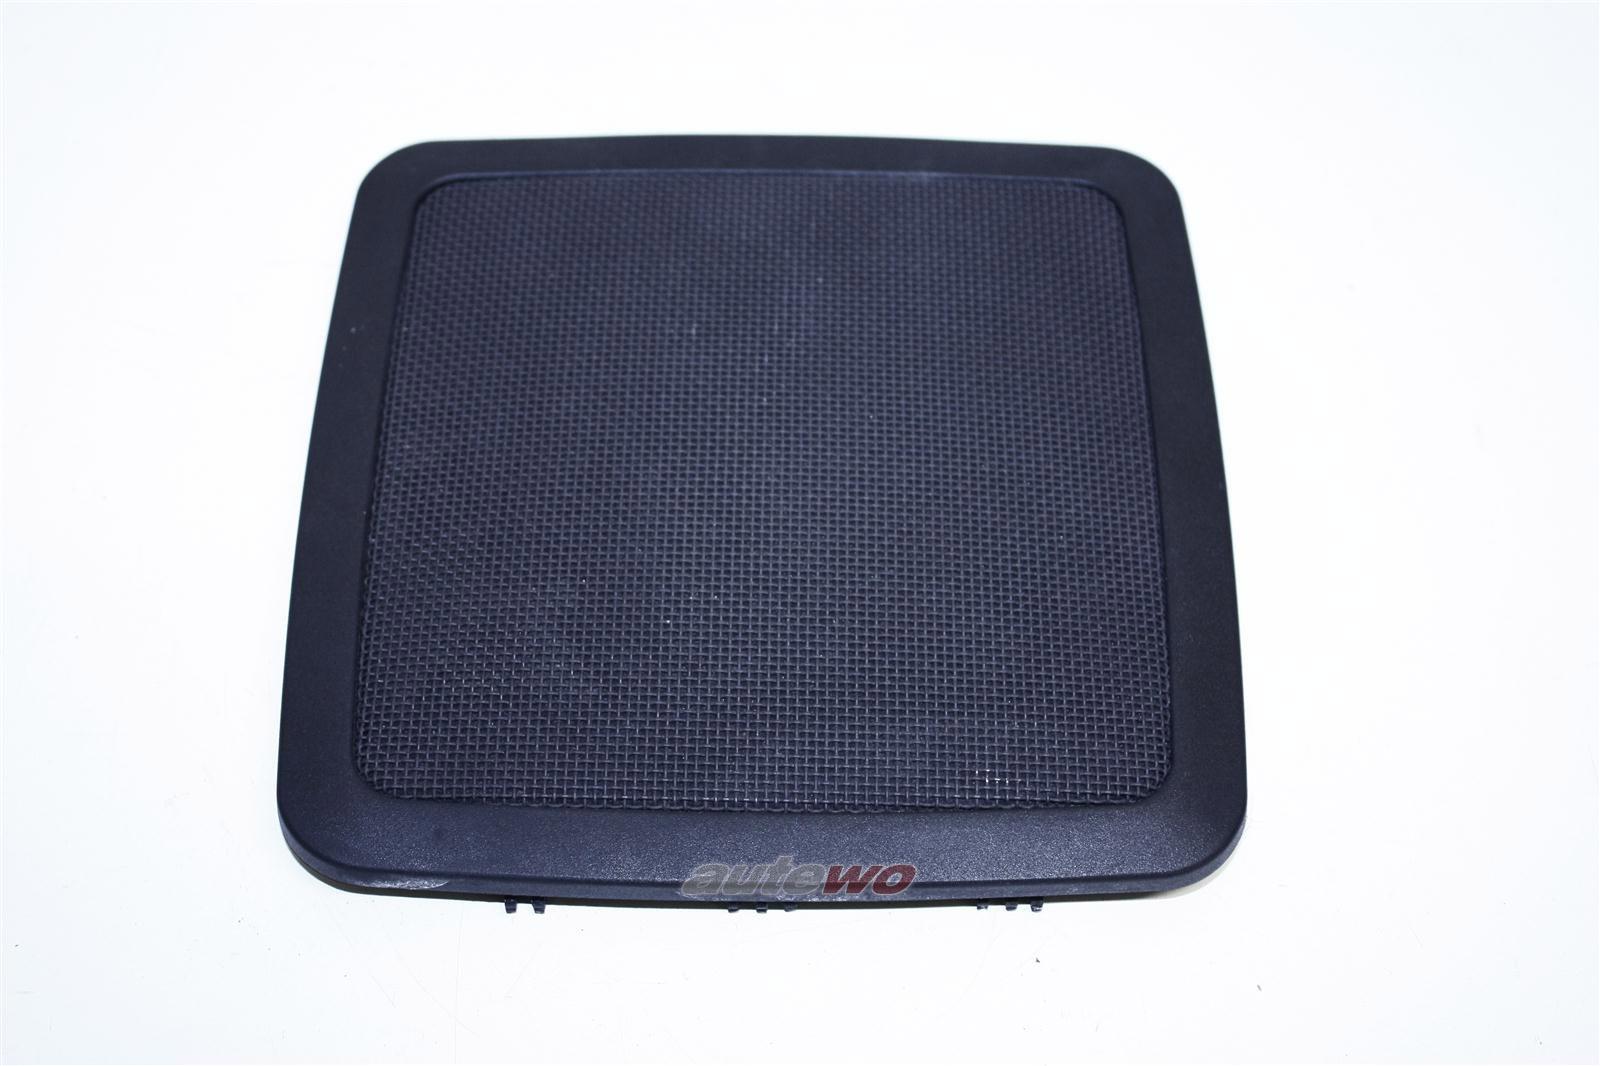 Audi 100/200 Typ 44 Gitter Lautsprecher Hutablage Hinten negro 443035407B